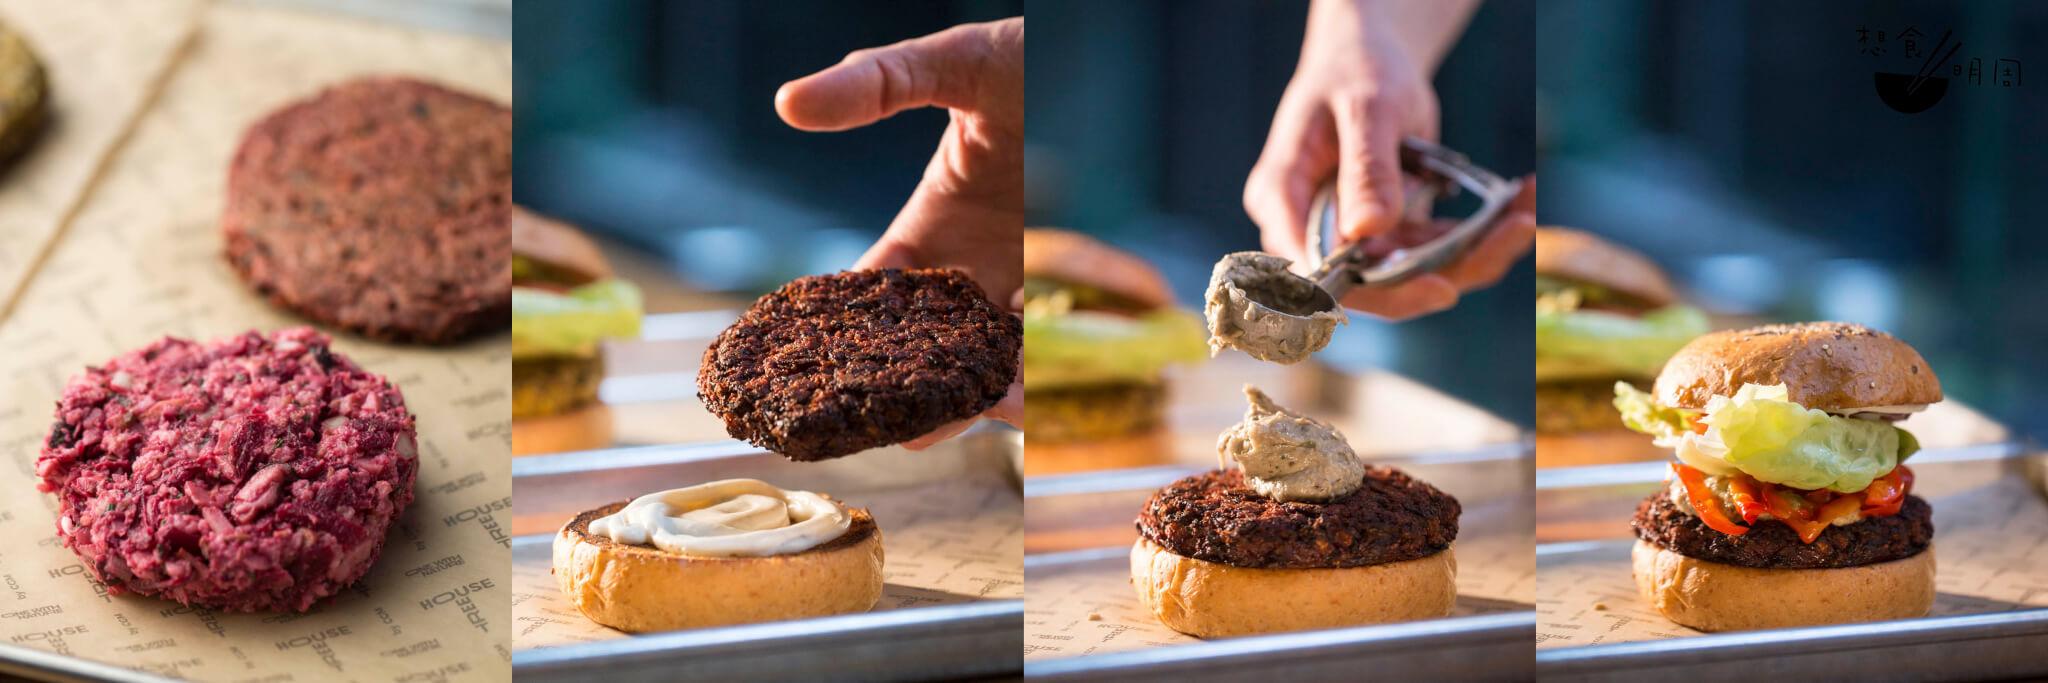 Forest Burger 紅菜頭的鮮紅色澤,總是被用於作 為天然染料,套用在漢堡扒上亦如 是。碾削成條之後,才與其他食材 一起搓成漢堡扒以增強口感。烤焗 之前放在包體上,添進烤茄子蓉 (eggplant caviar)、 烤 紅 椒、 鮮 蔬、 及素蛋黃醬。對食材的堅持,不 只在餡料中,連底面的脆包都選用 Sourdough,就為了讓進食後容易 消化。($98/單點,+$50配番薯條、 沙律及檸檬水)